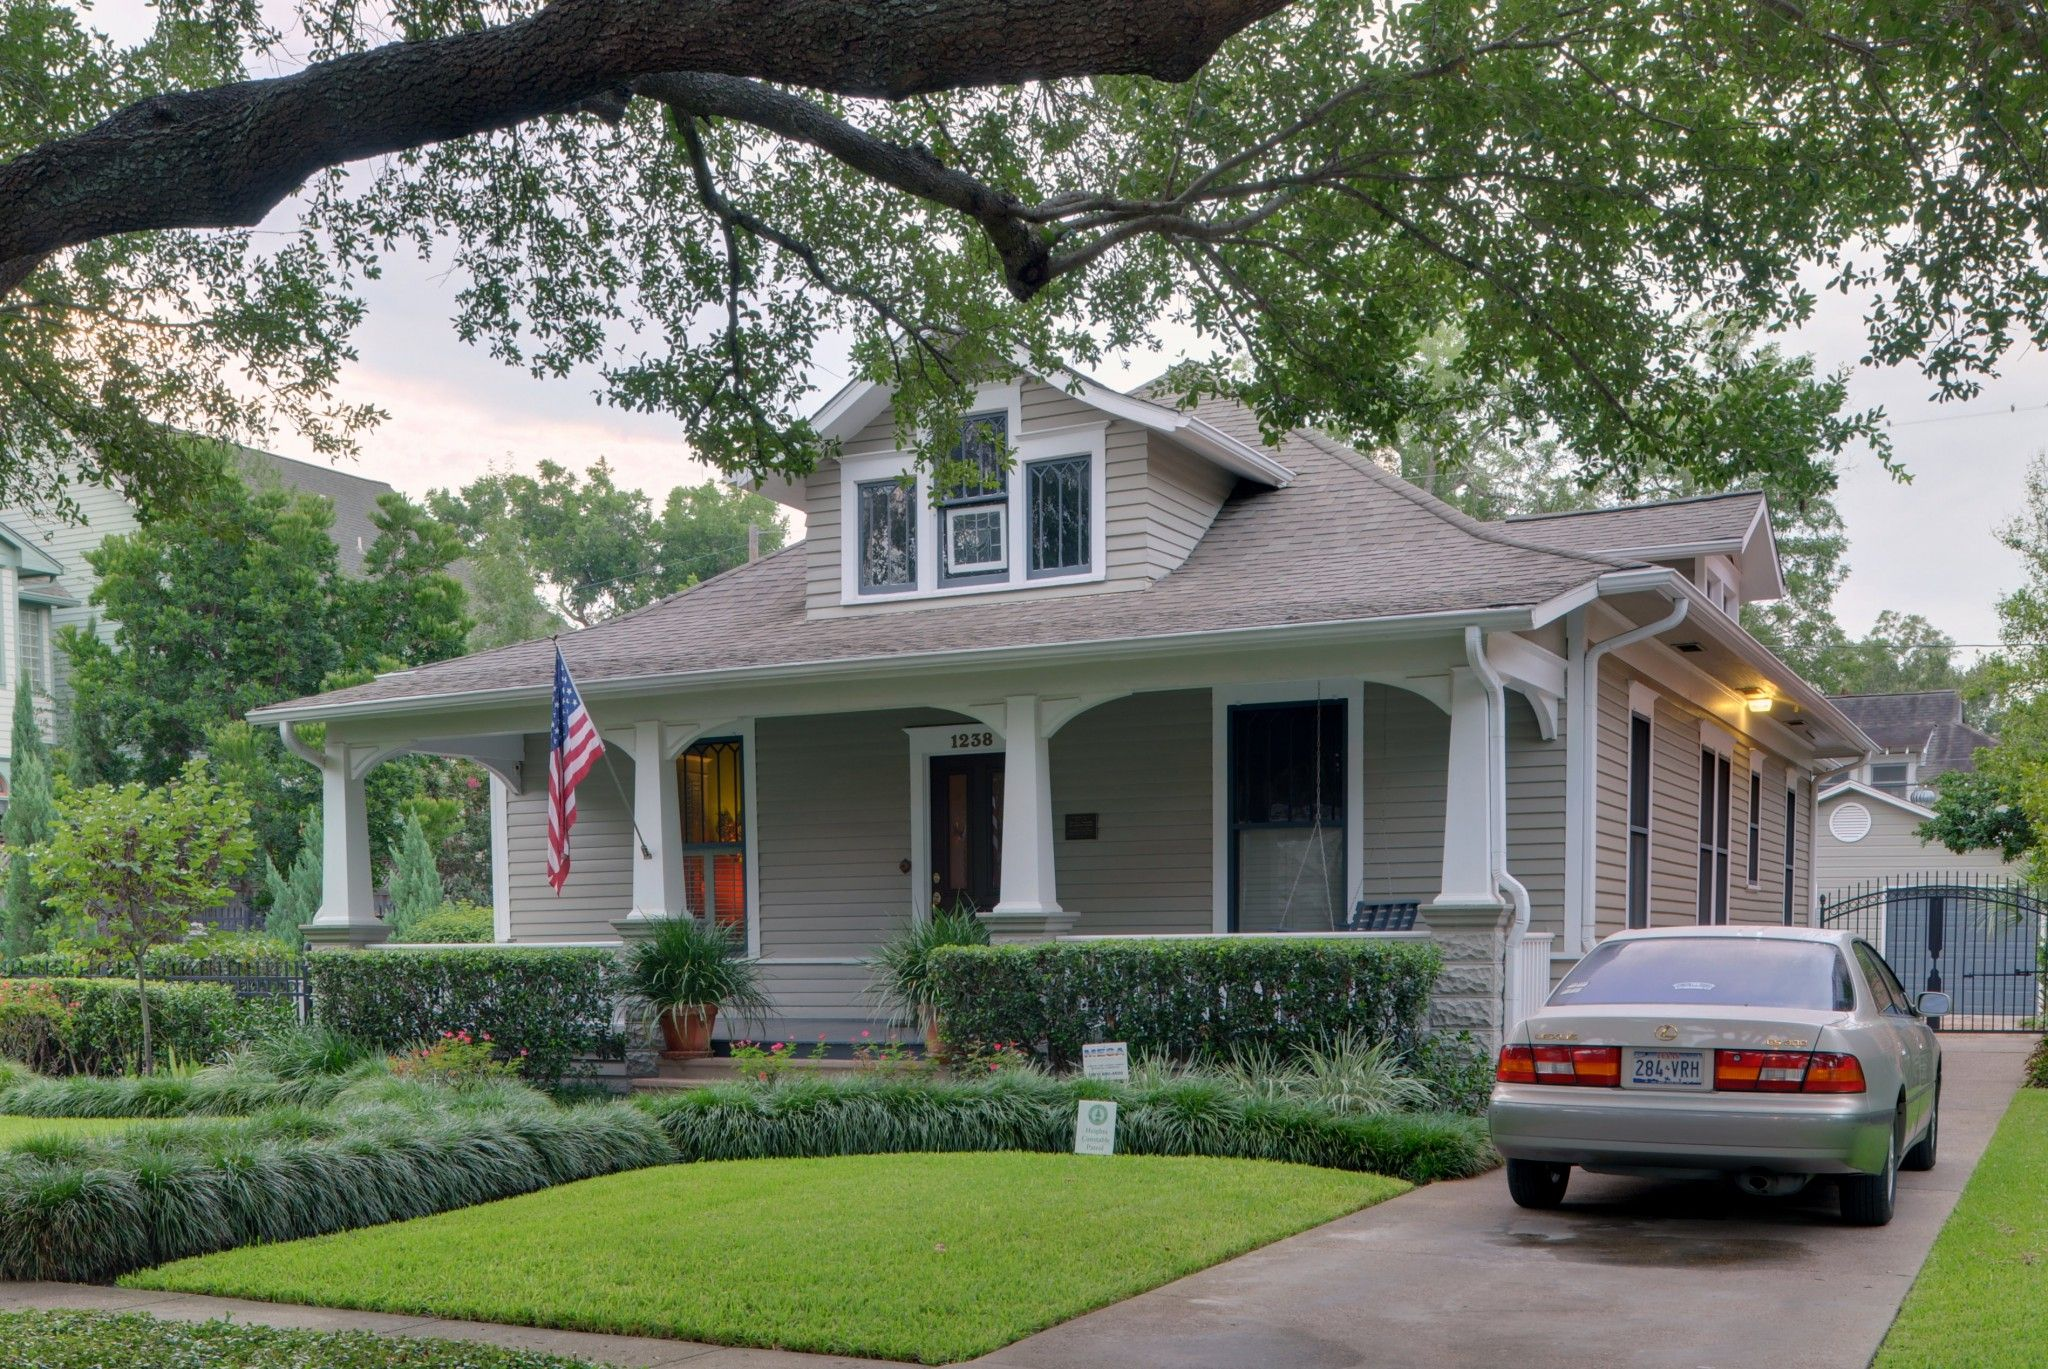 Craftsman bungalow traditional exterior minneapolis by richard - 1940s Cottage Shake Shingle Gable Google Search Siding Exterior Pinterest Shake Shingle And Exterior